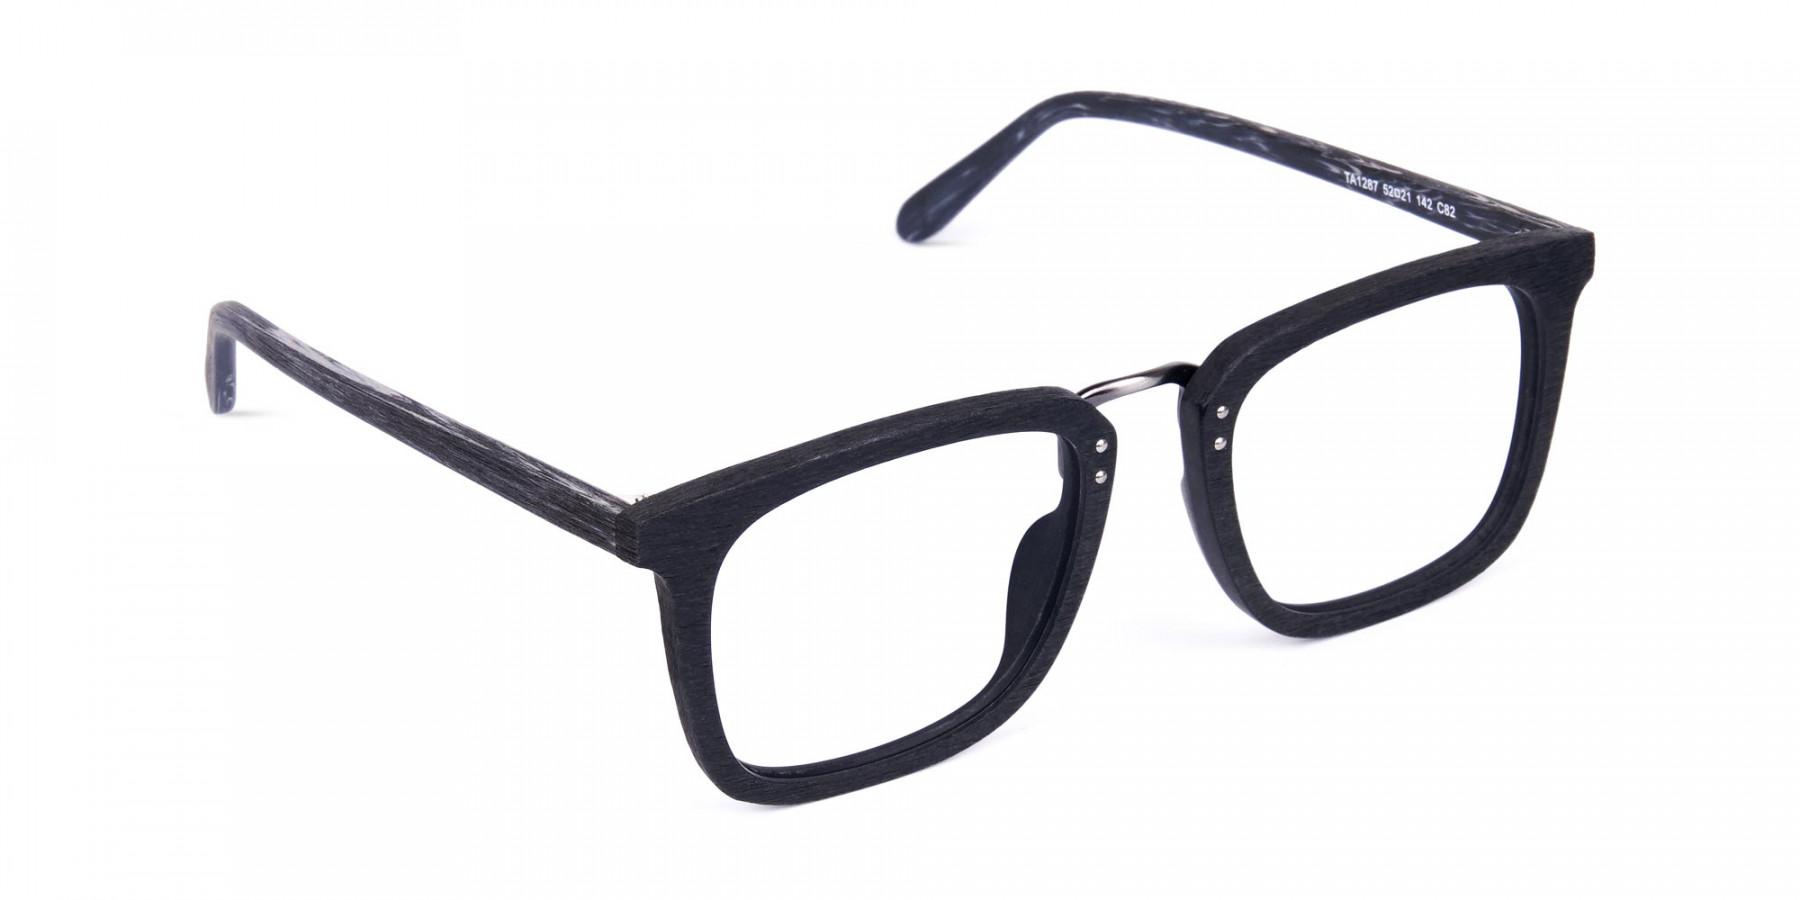 Wooden-Texture-Black-Square-Glasses-1